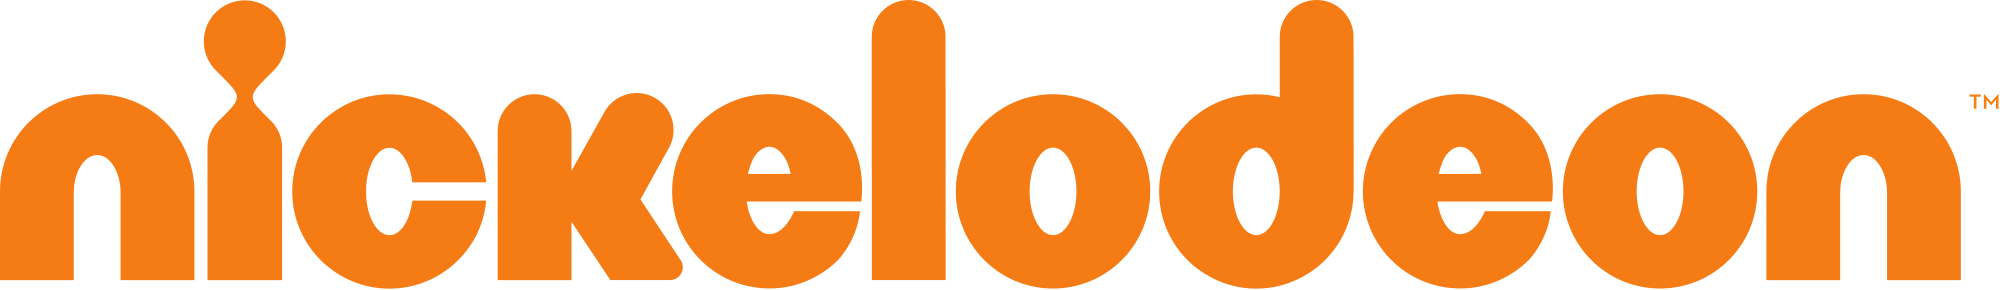 Datei:Nickelodeon logo 2009.png